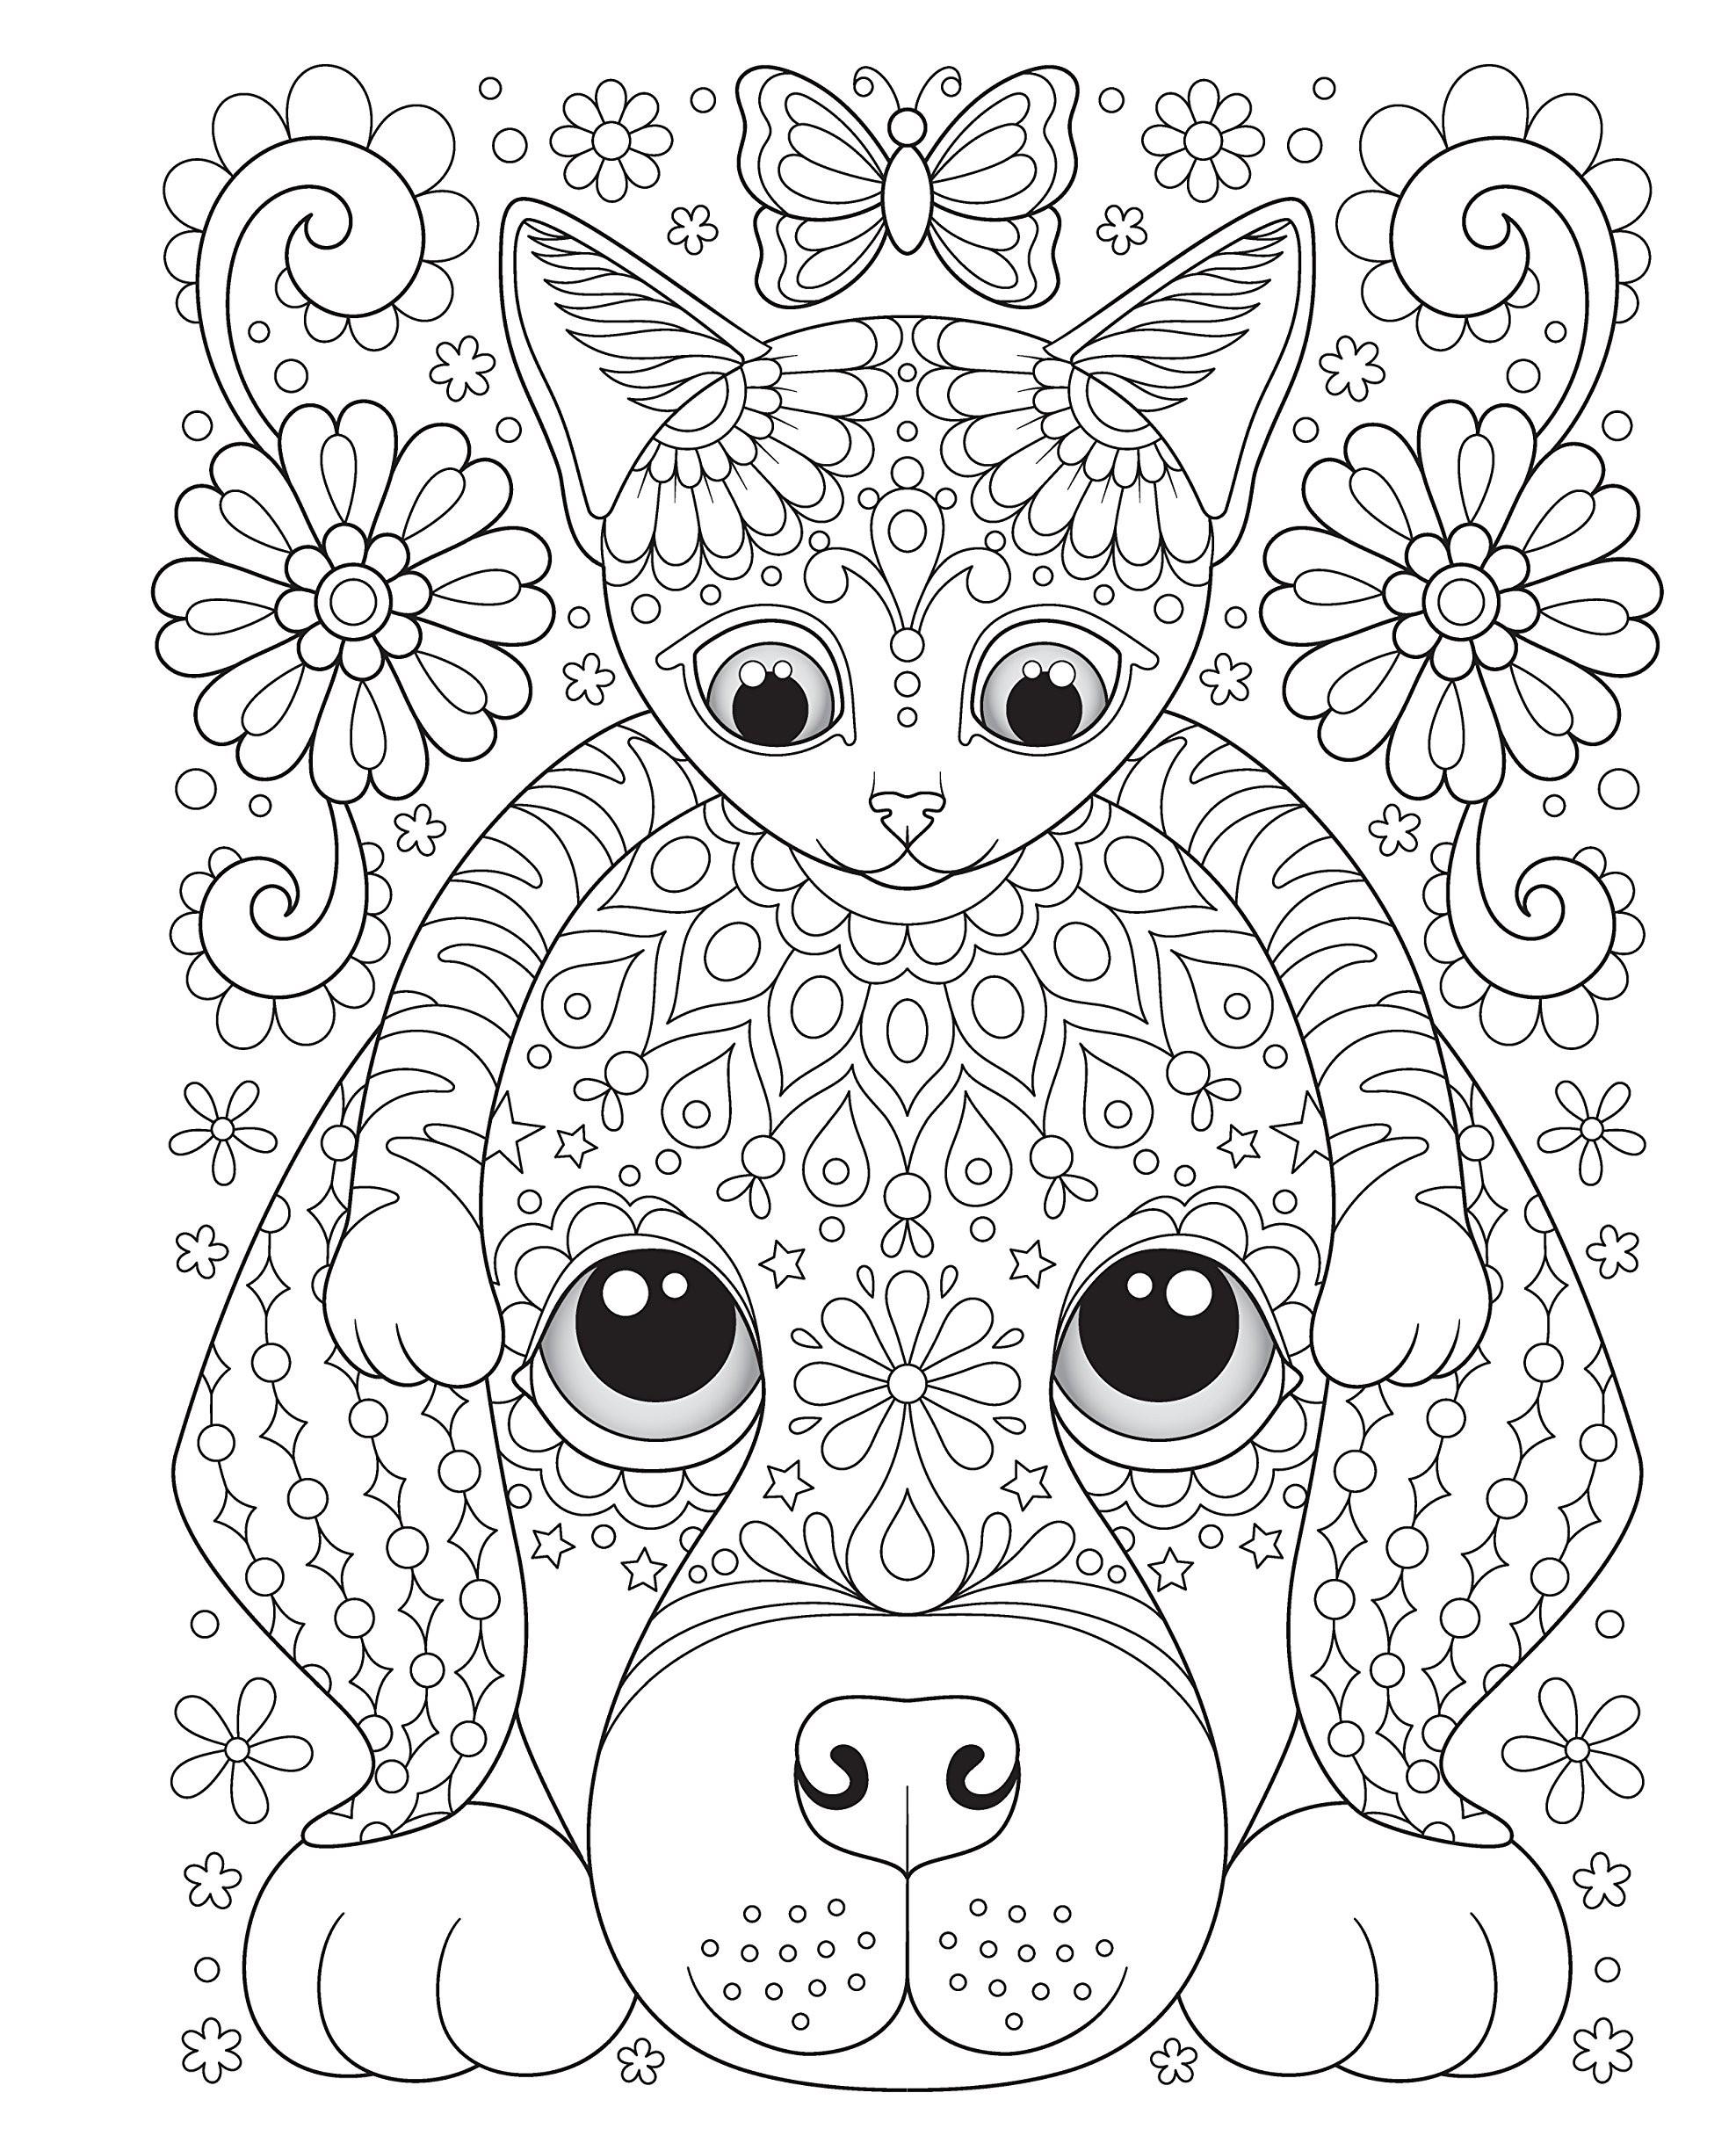 Дружба - кошка и собака - Животные - Раскраски антистресс